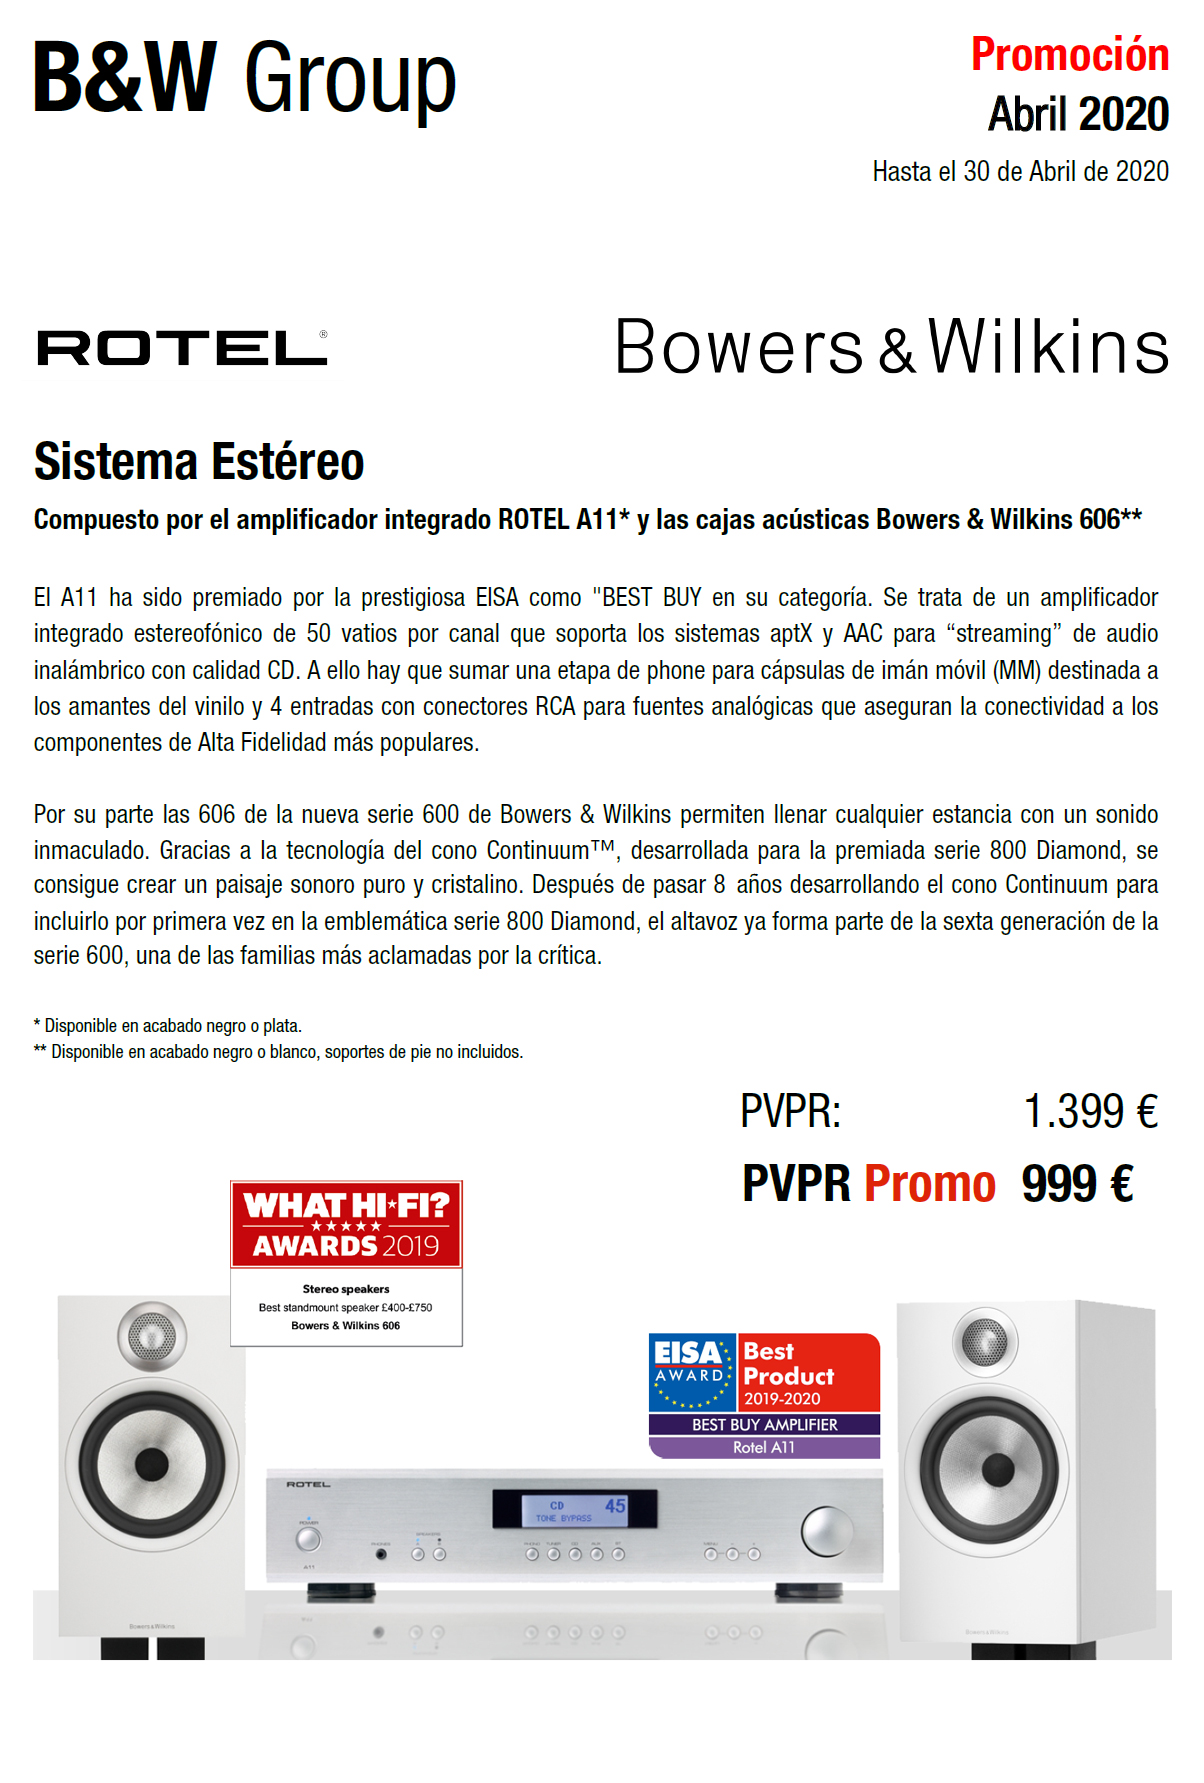 oferta-bw-606-rotel-a11-abril-2020